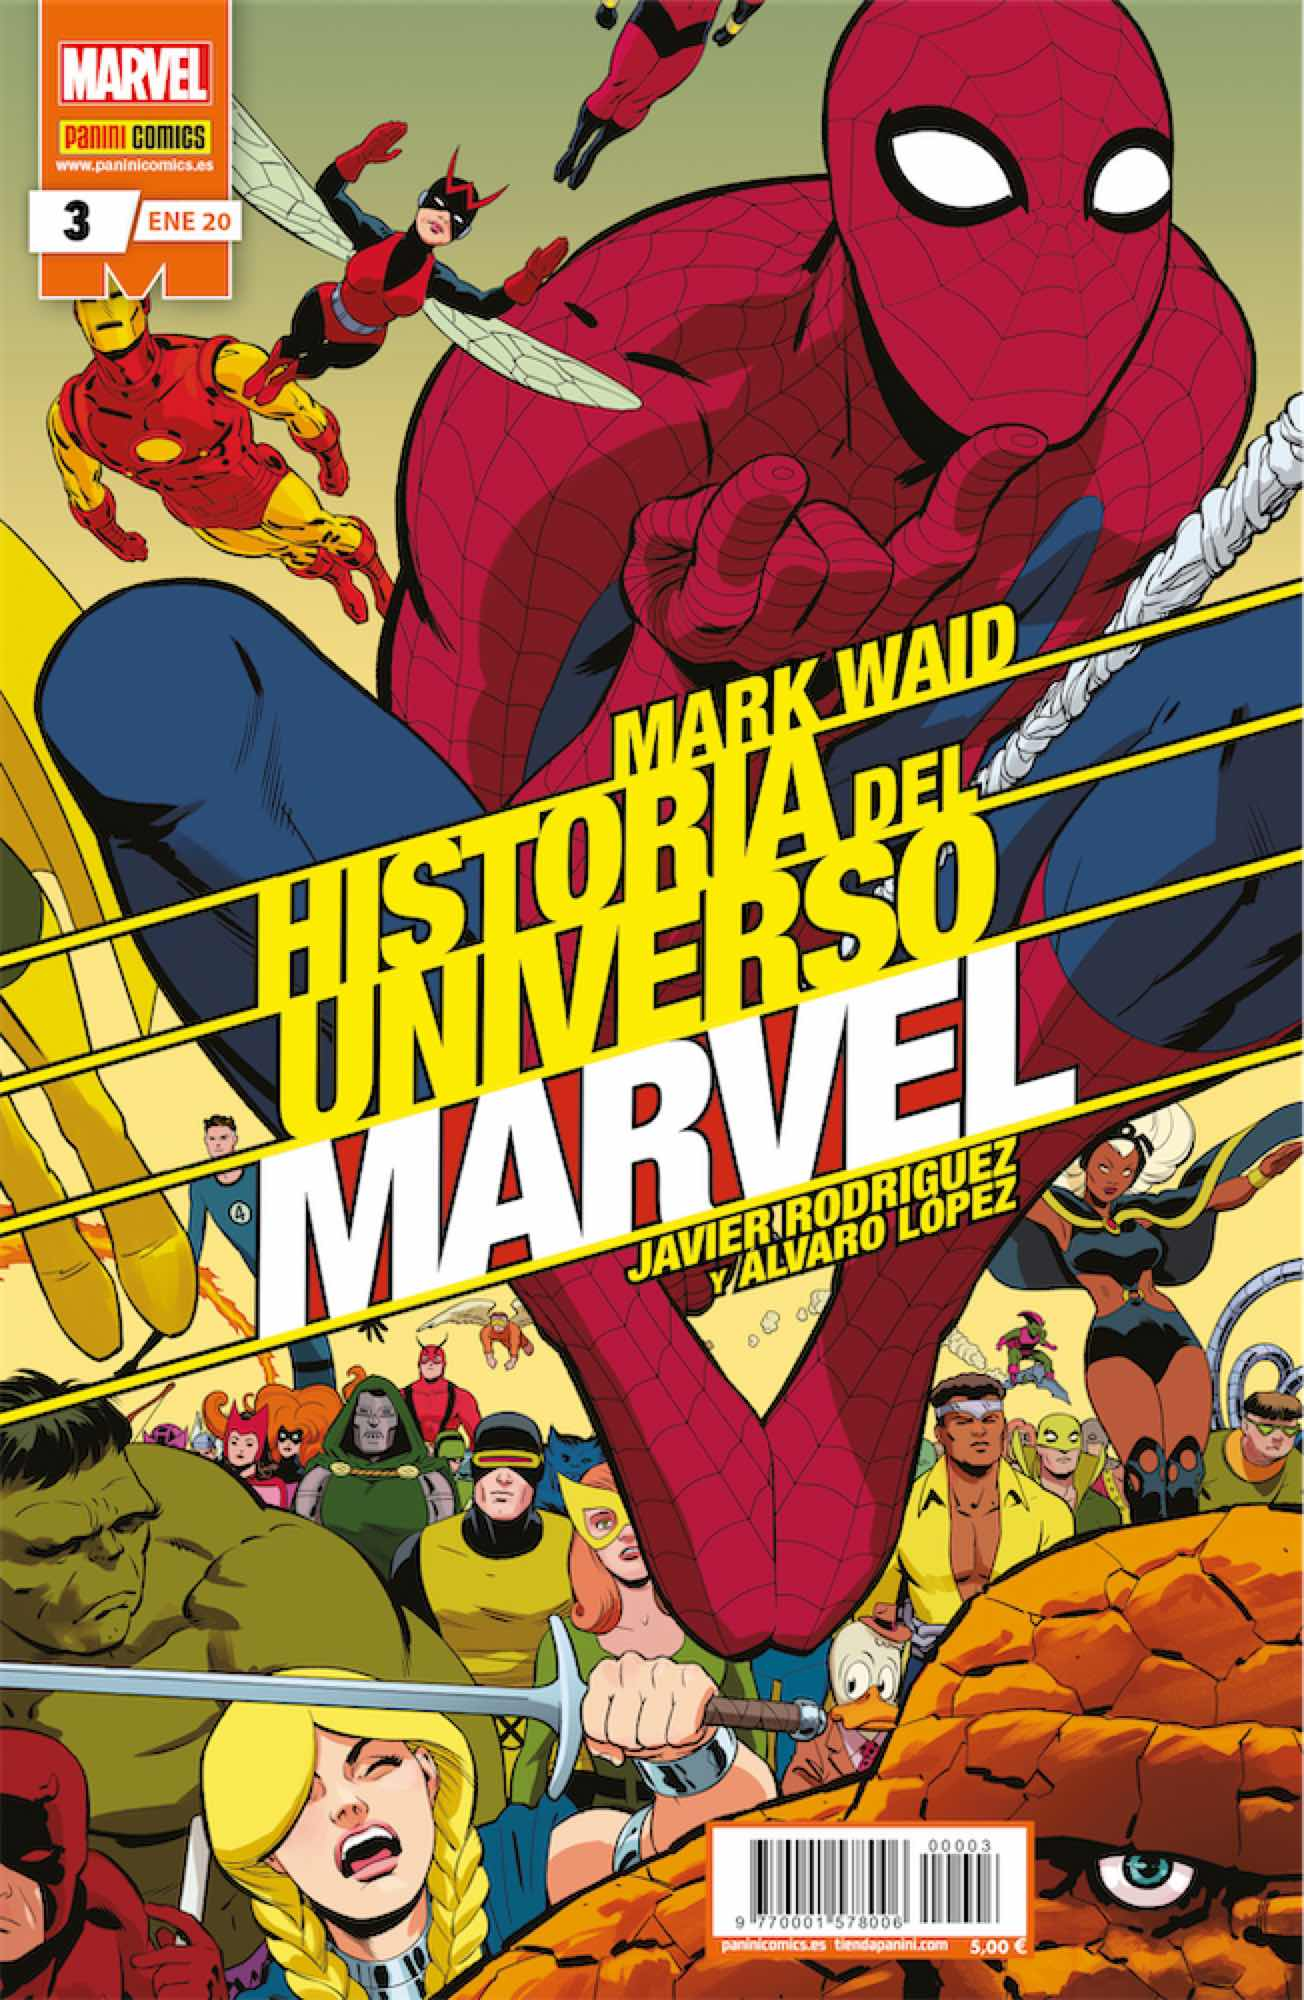 HISTORIA DEL UNIVERSO MARVEL 03 (EDICION ESPECIAL)